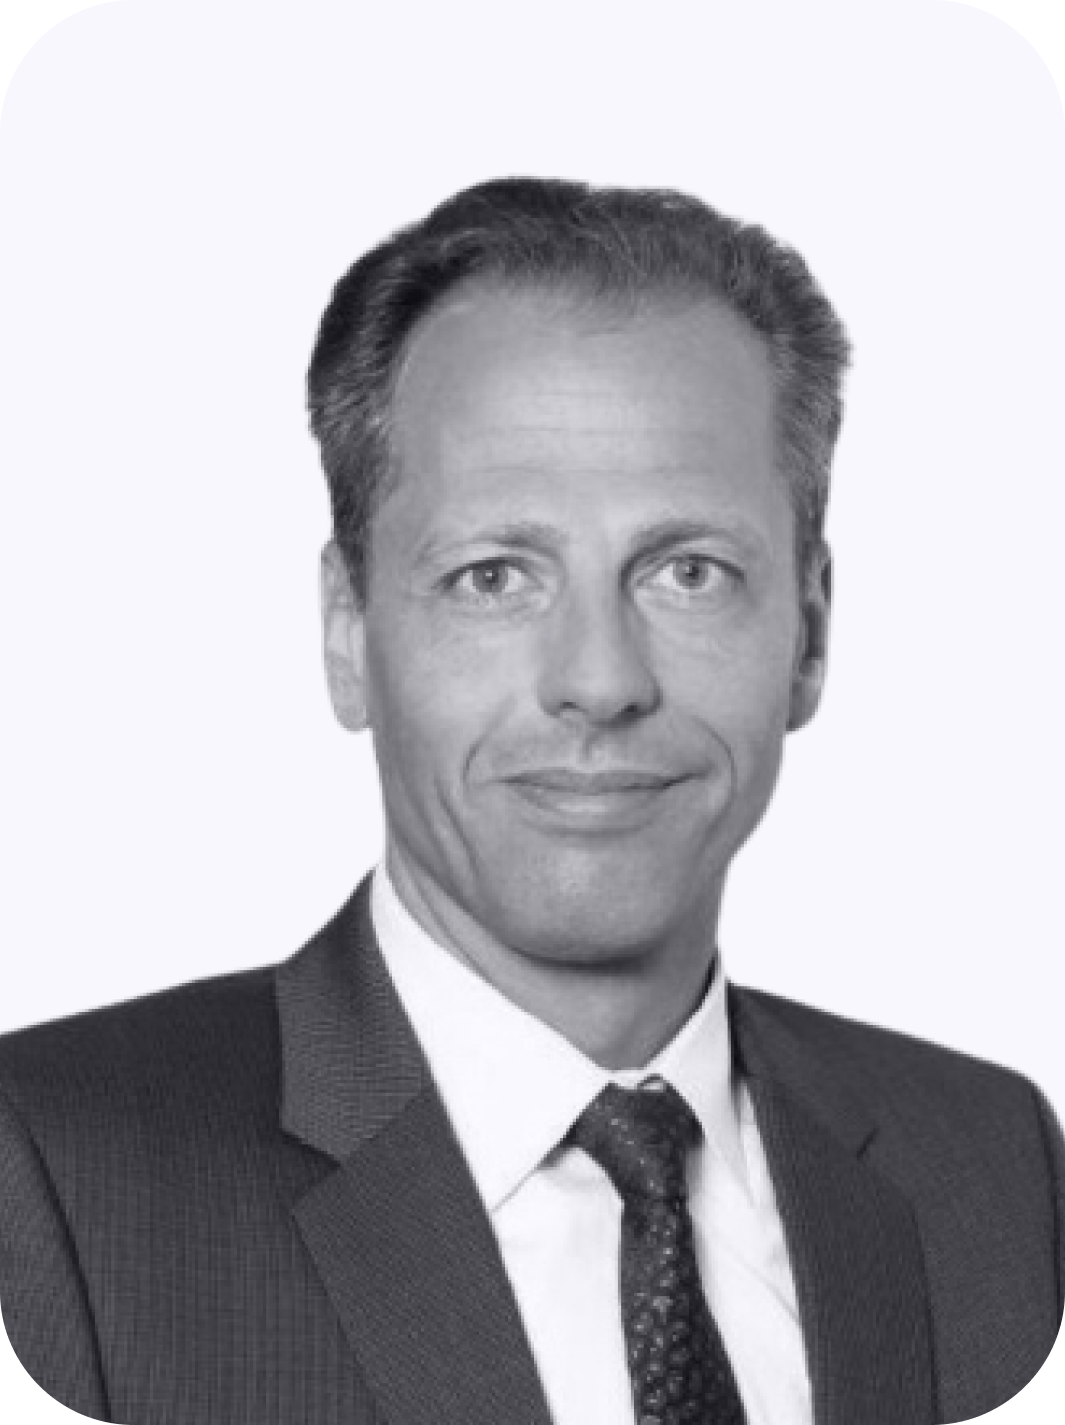 Jens Weinem